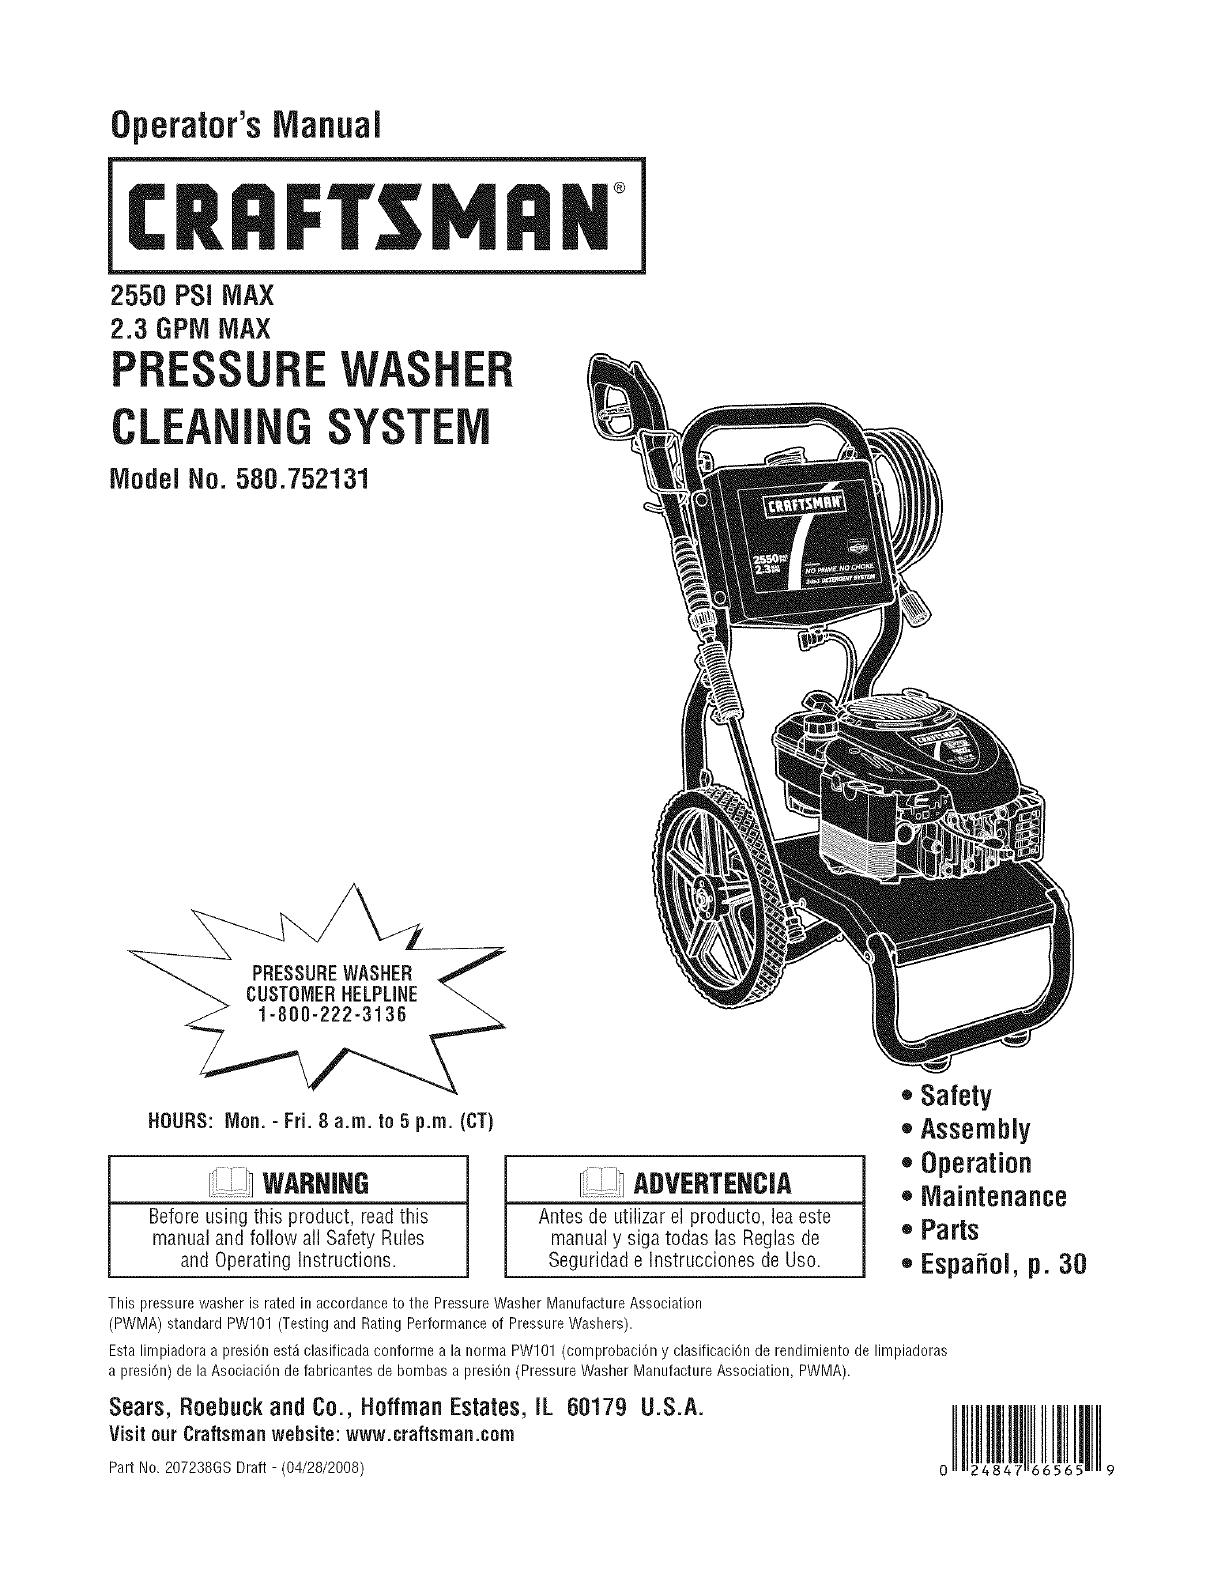 Carburetor Kit For Craftsman 580.752131 2550 PSI 2.3 GPM Pressure Washer